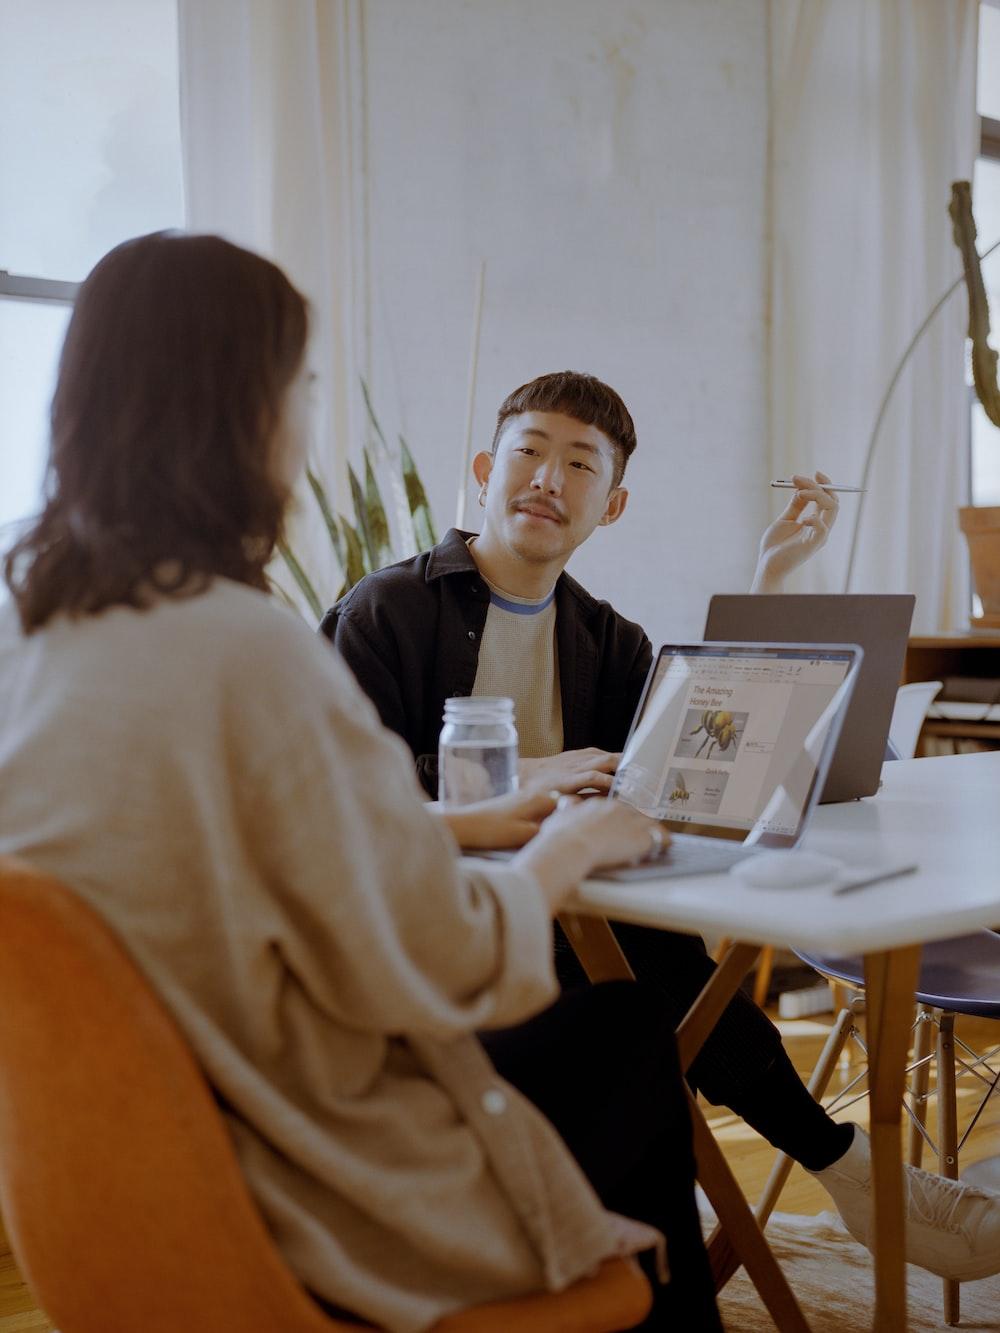 woman in white long sleeve shirt sitting beside boy in black shirt